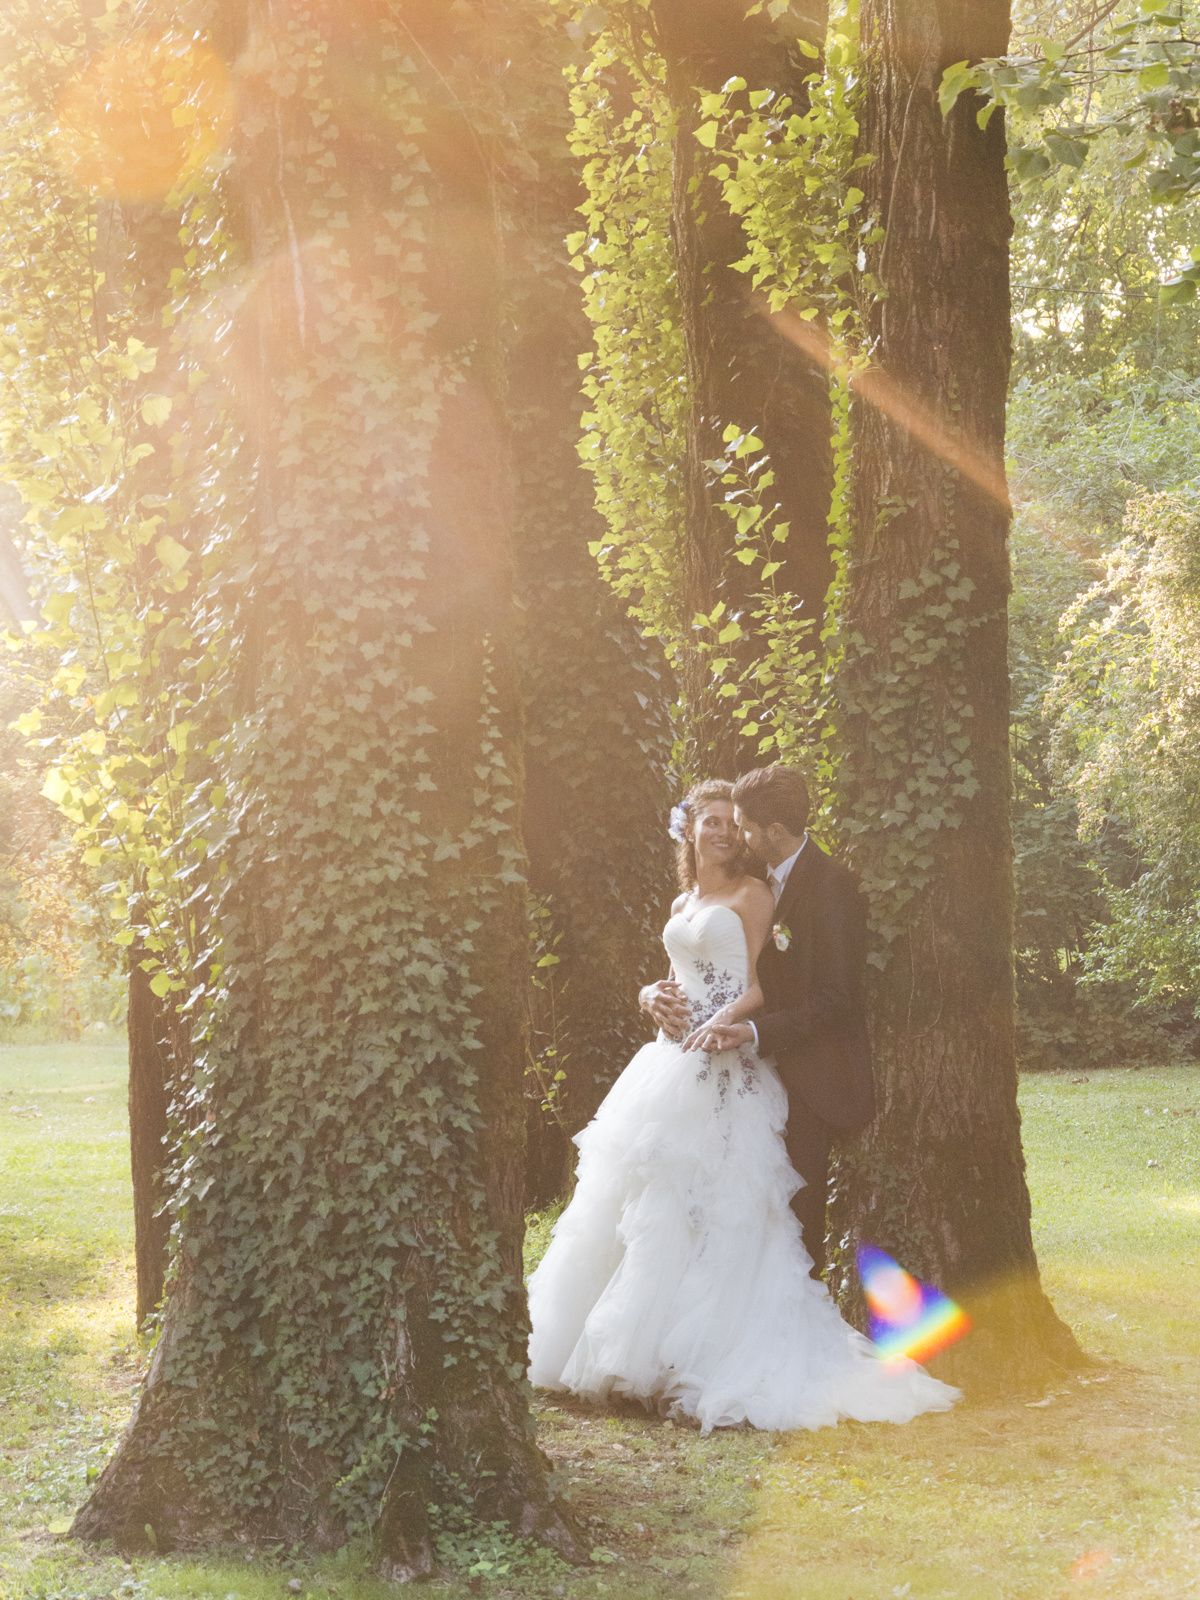 Real wedding   Chiara+Marco - Romantic photo session at the sunset @ Villa Ferrari wonderful garden. www.weddintellers.net